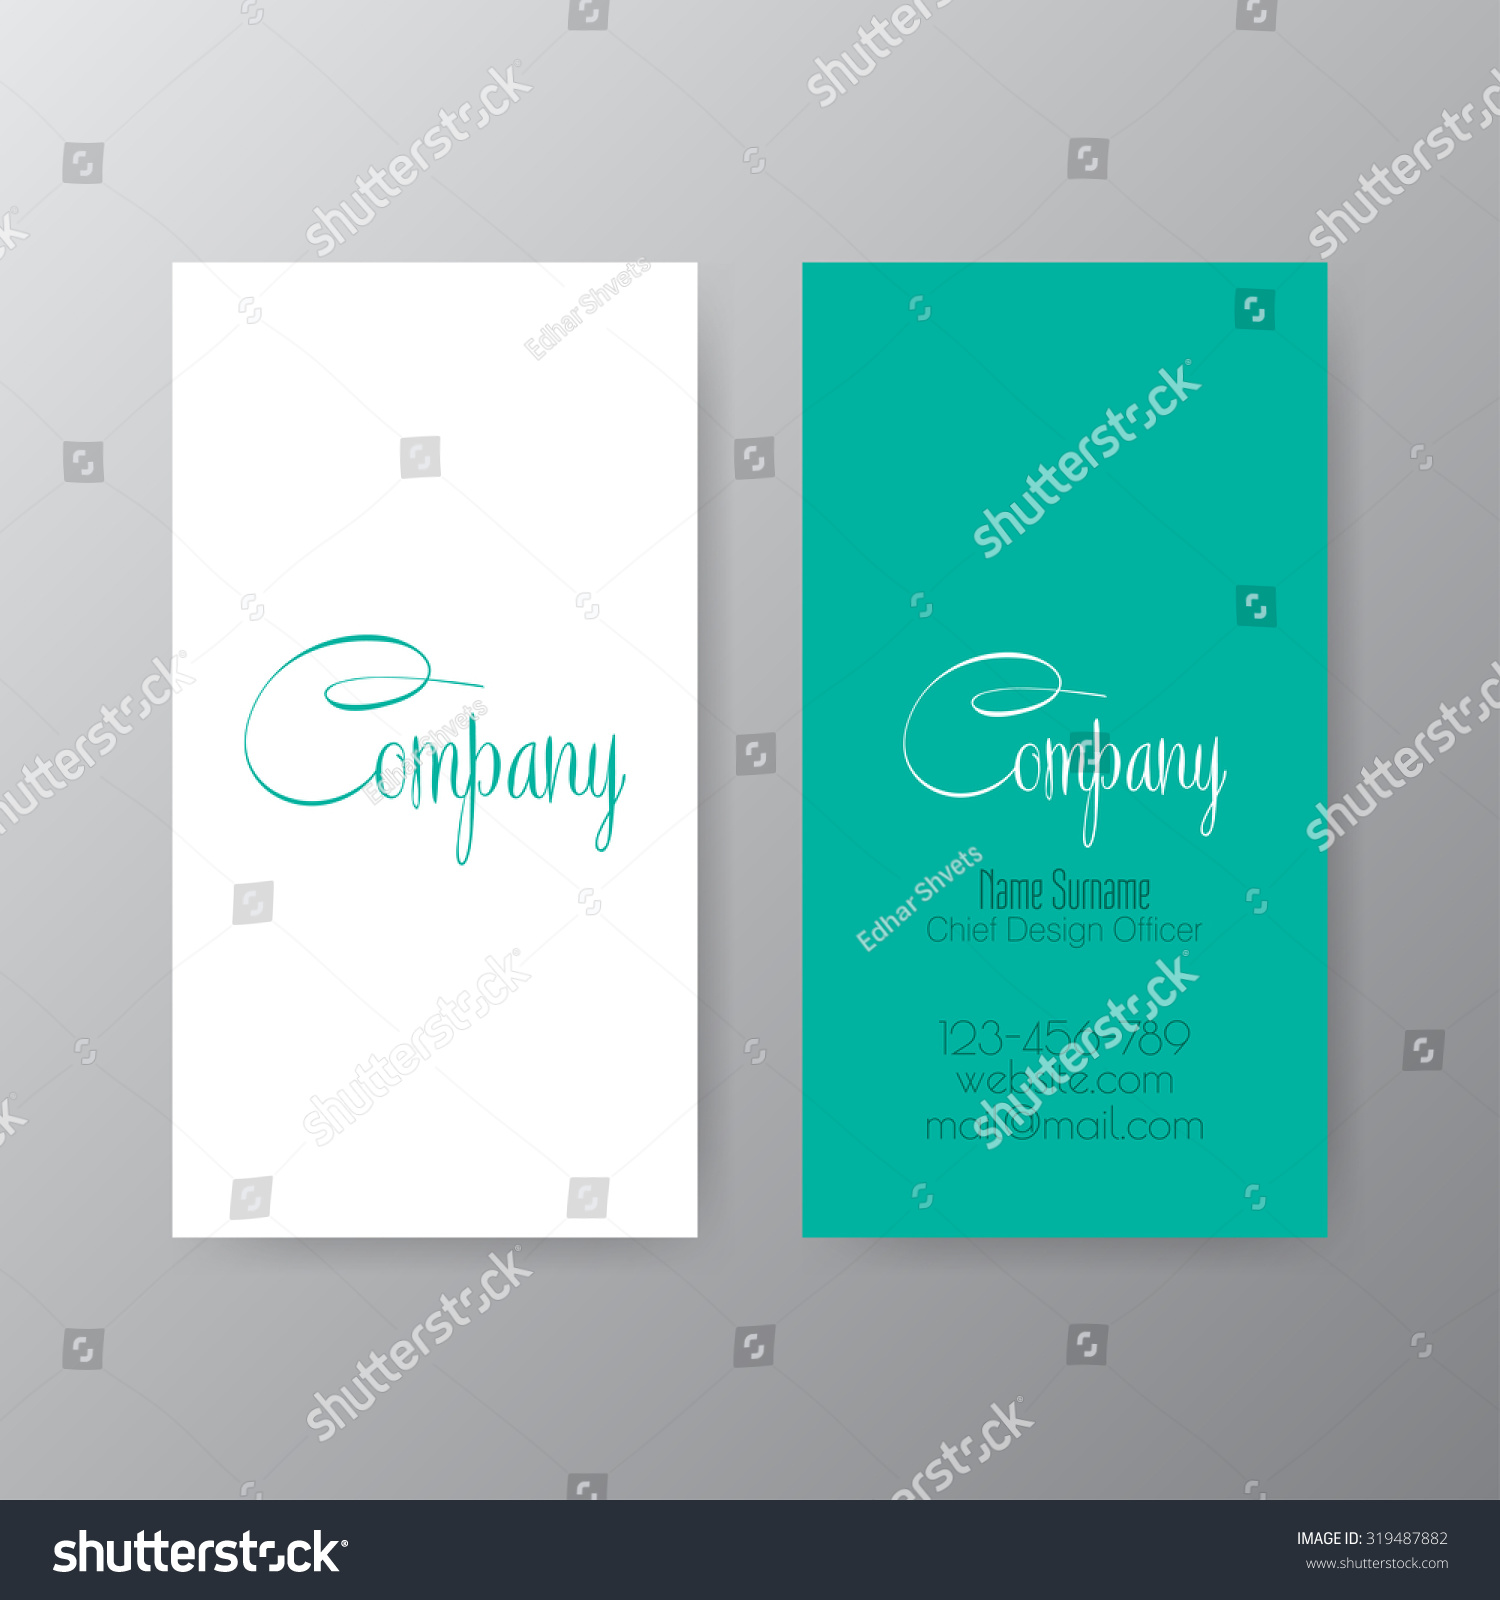 Editable Business Card Set 85 X Stock Vector 319487882 - Shutterstock